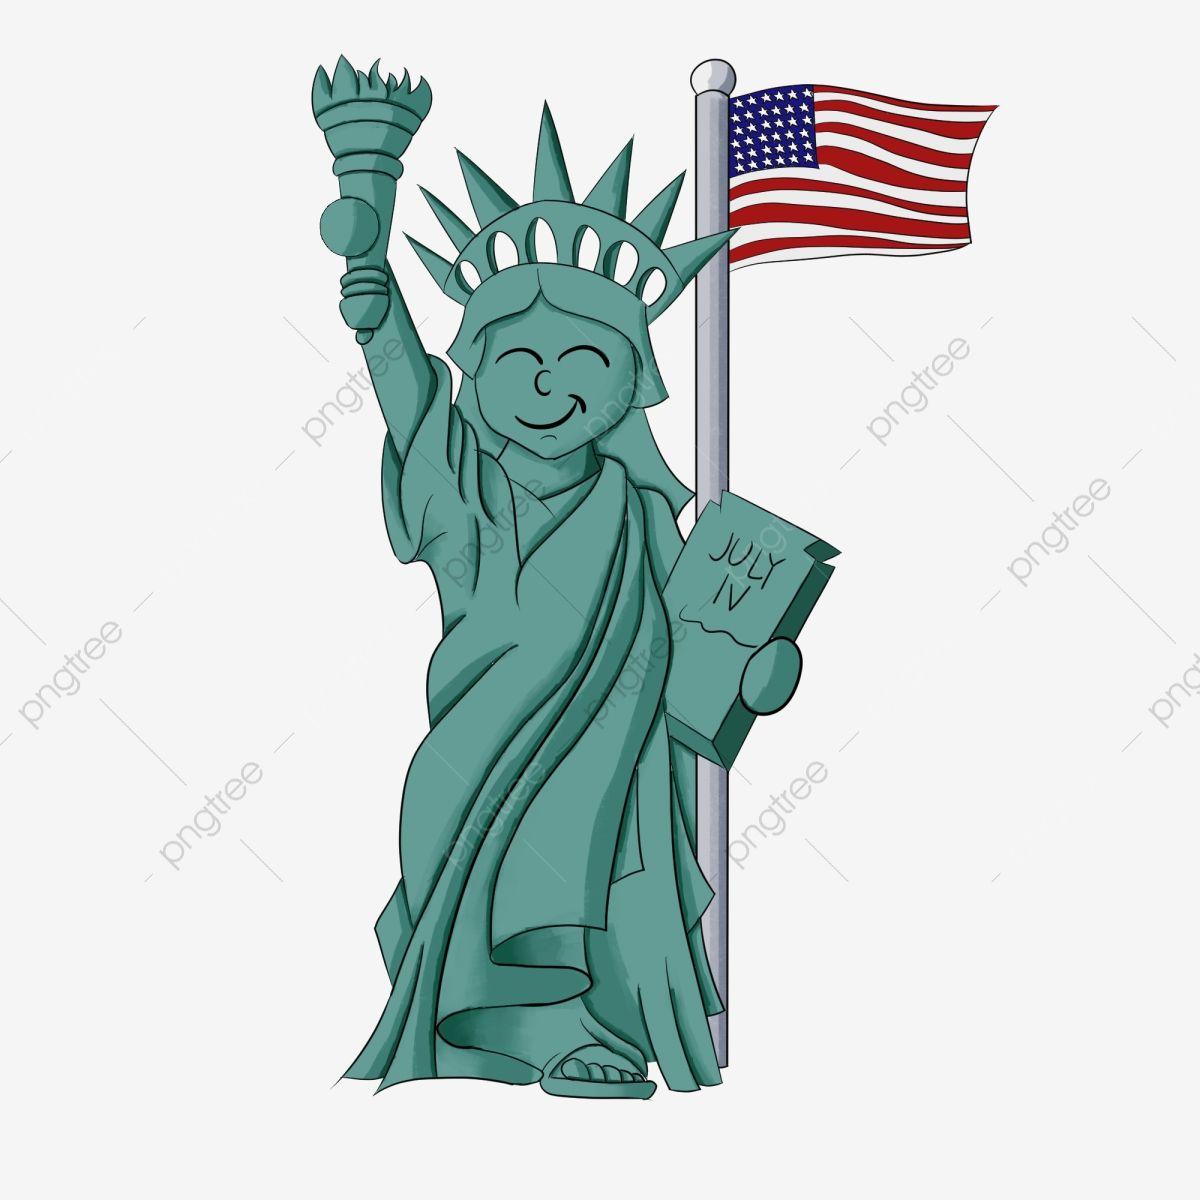 Estatua De La Libertad Punto De Referencia Viajar Al Extranjero Estados Unidos Version Q Ban Estatua De La Libertad Dibujo De Estatua De La Libertad Estatuas